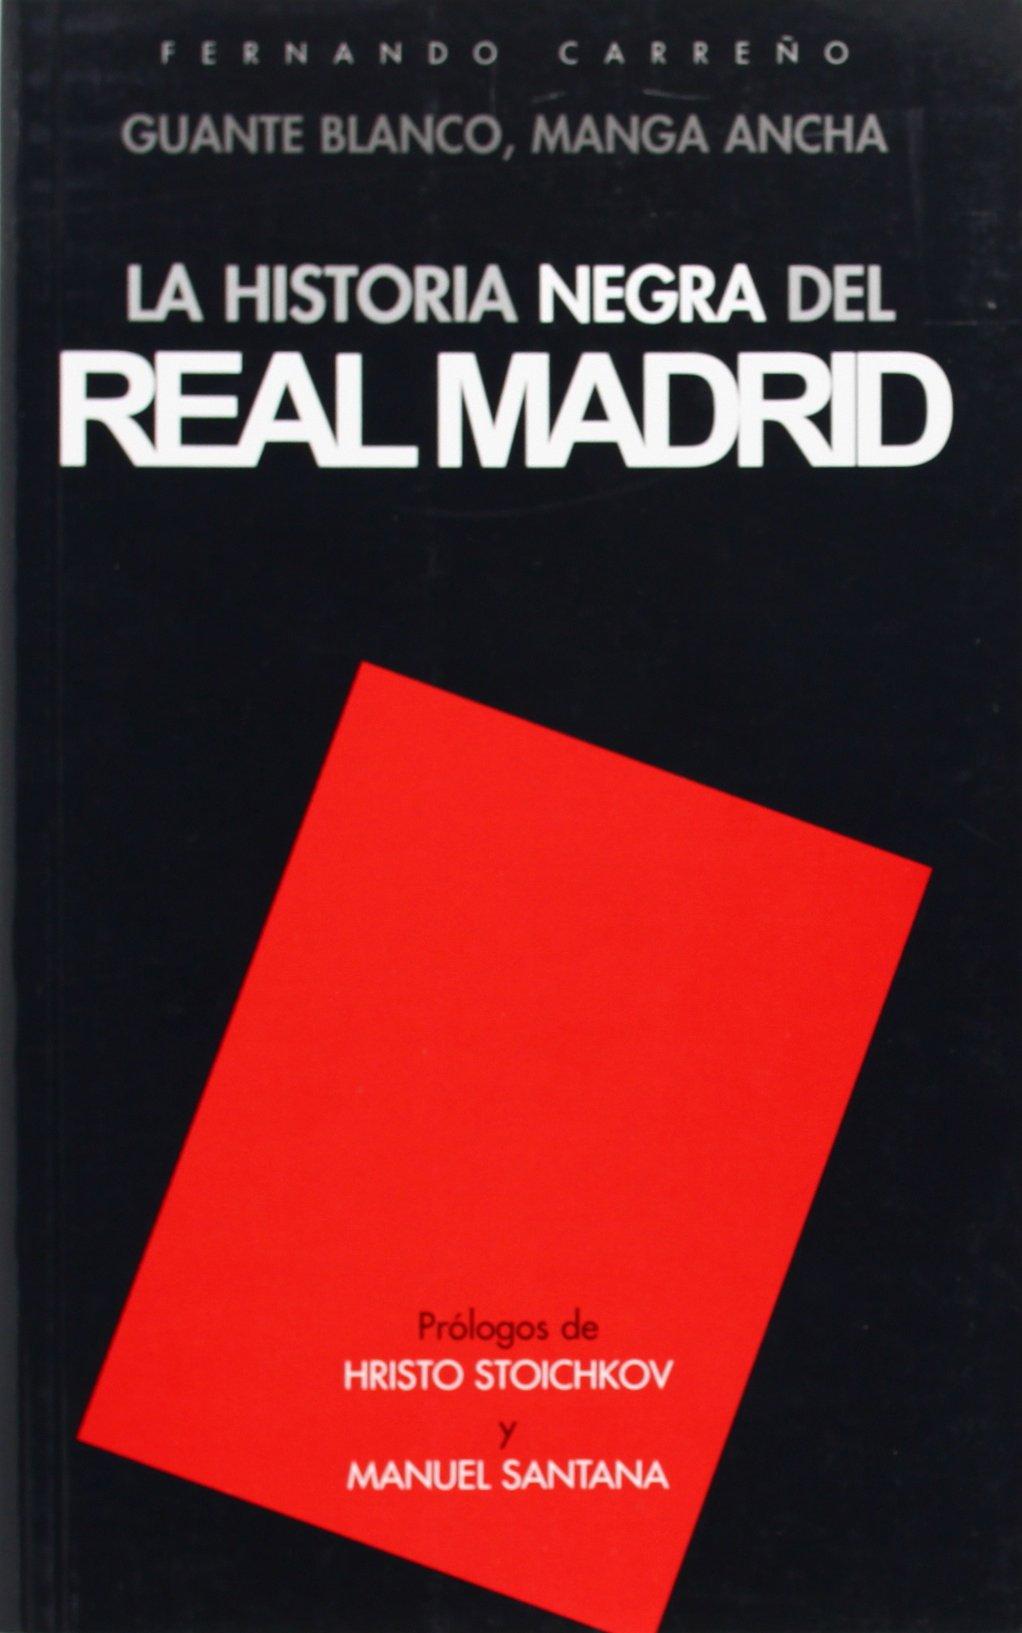 La Historia Negra del Real Madrid: Guante Blanco, Manga Ancha (Spanish Edition) (Spanish) Paperback – 2003